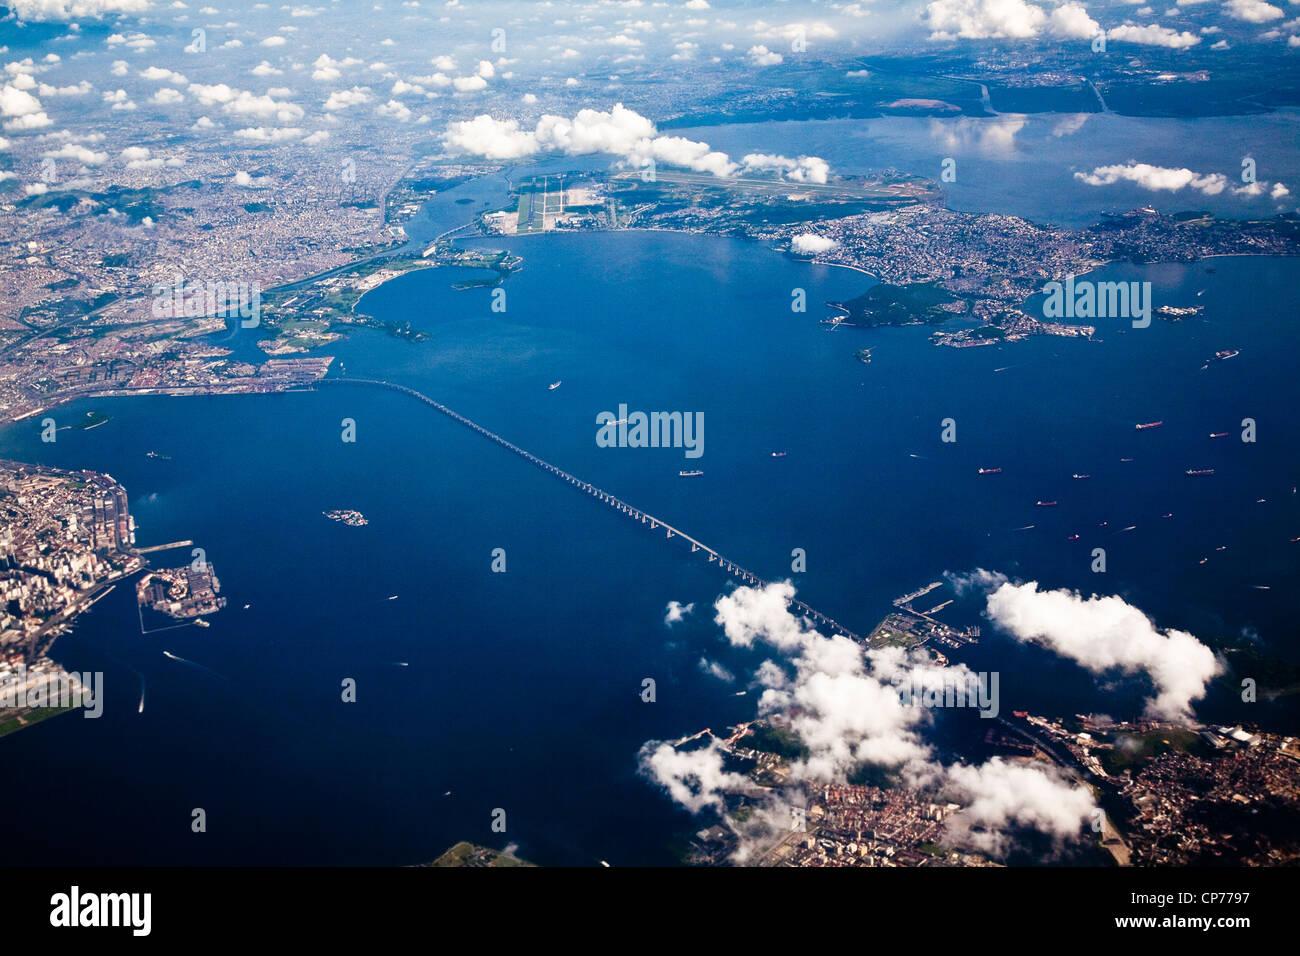 Aerial view of Guanabara Bay Baia da Guanabara crossed by Rio-Niterói Bridge Rio de Janeiro Brazil - Stock Image